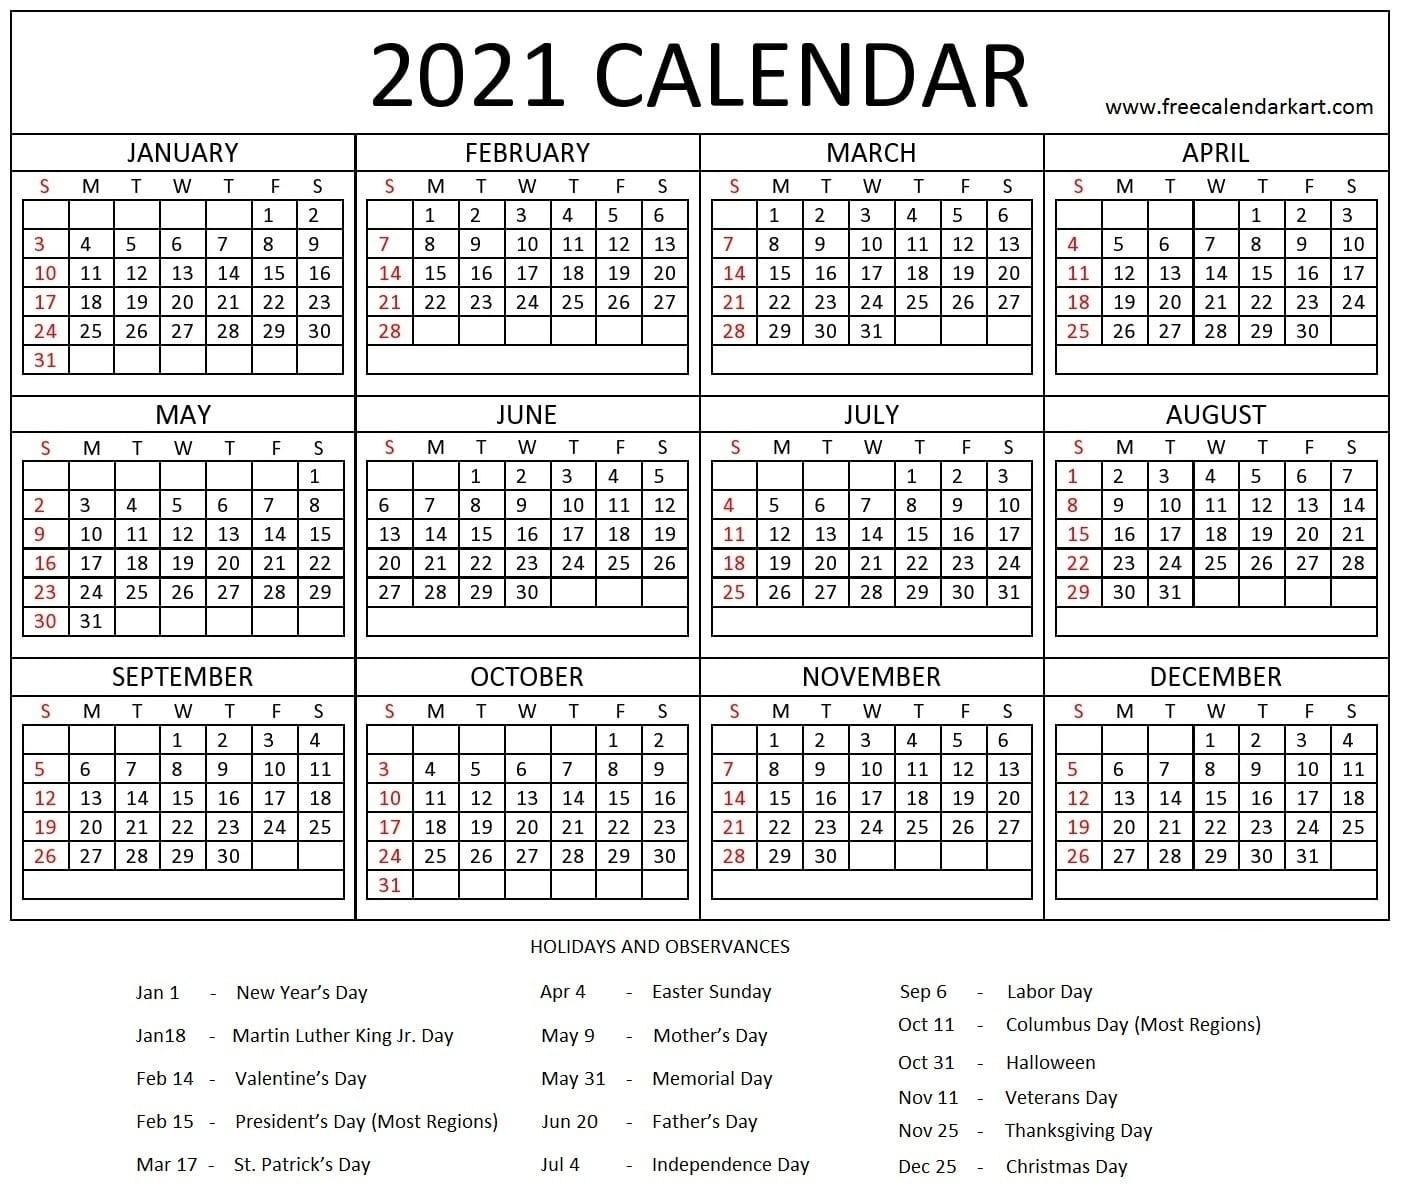 Printable Yearly 2021 Calendar And Holiday Template Free-Printable Healthcare Awareness Calendar 2021